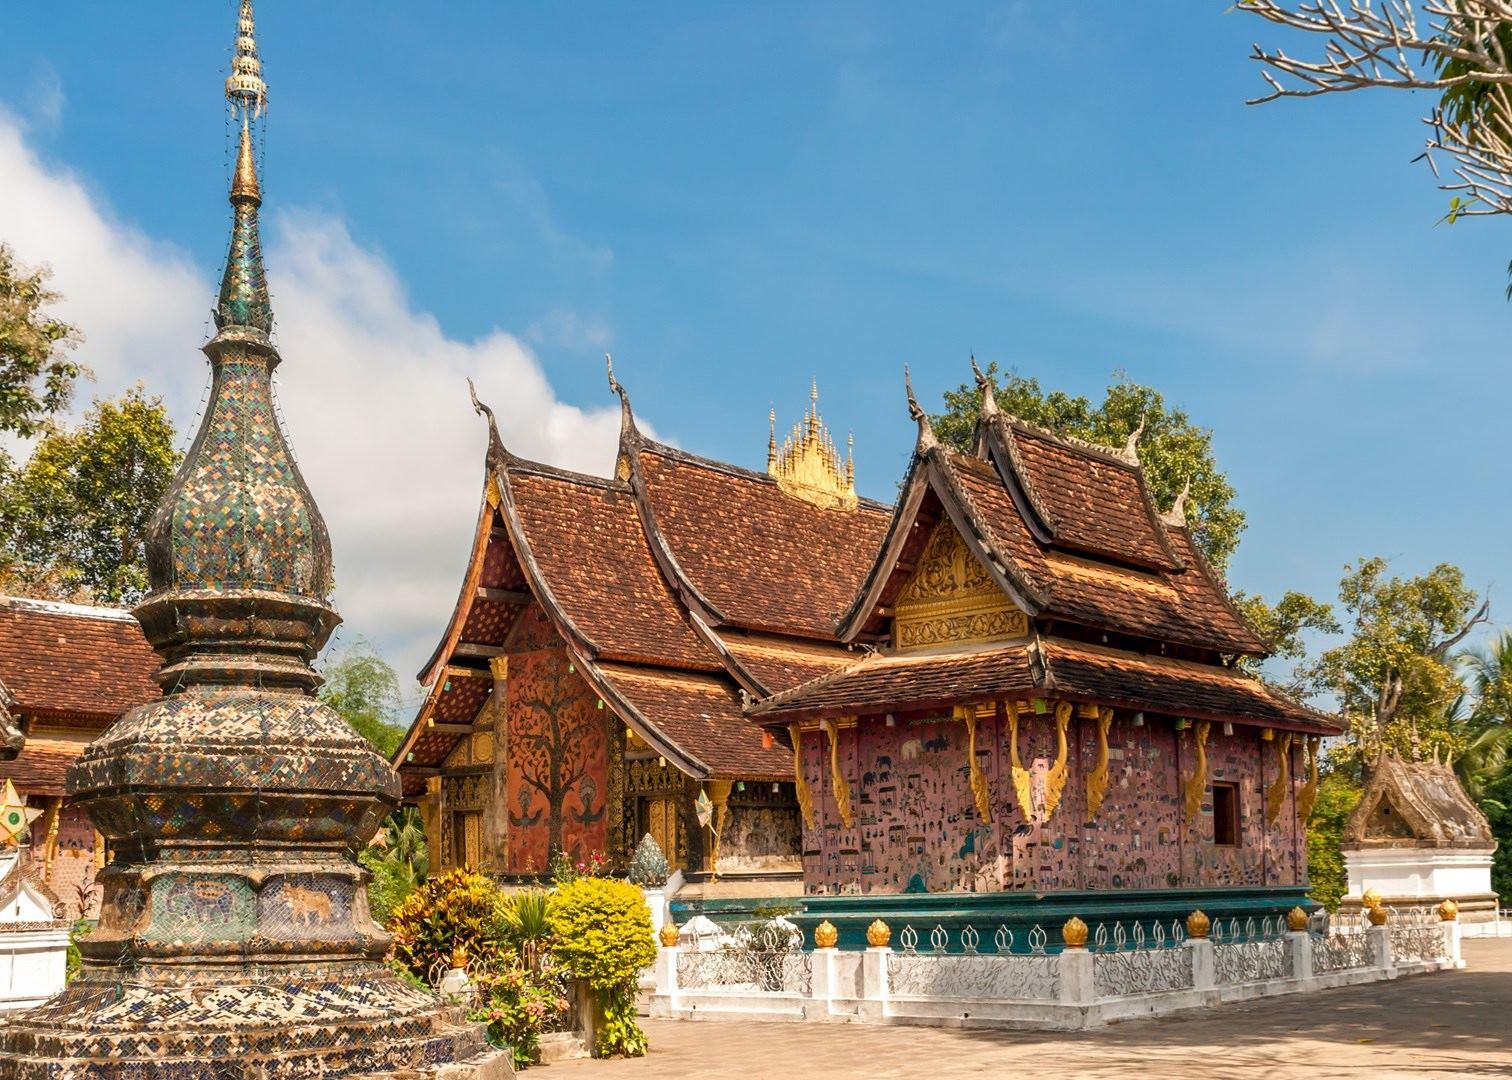 Luang Prabang Tours & Day Trips - Go Laos Tours |Wat Xieng Thong Luang Prabang